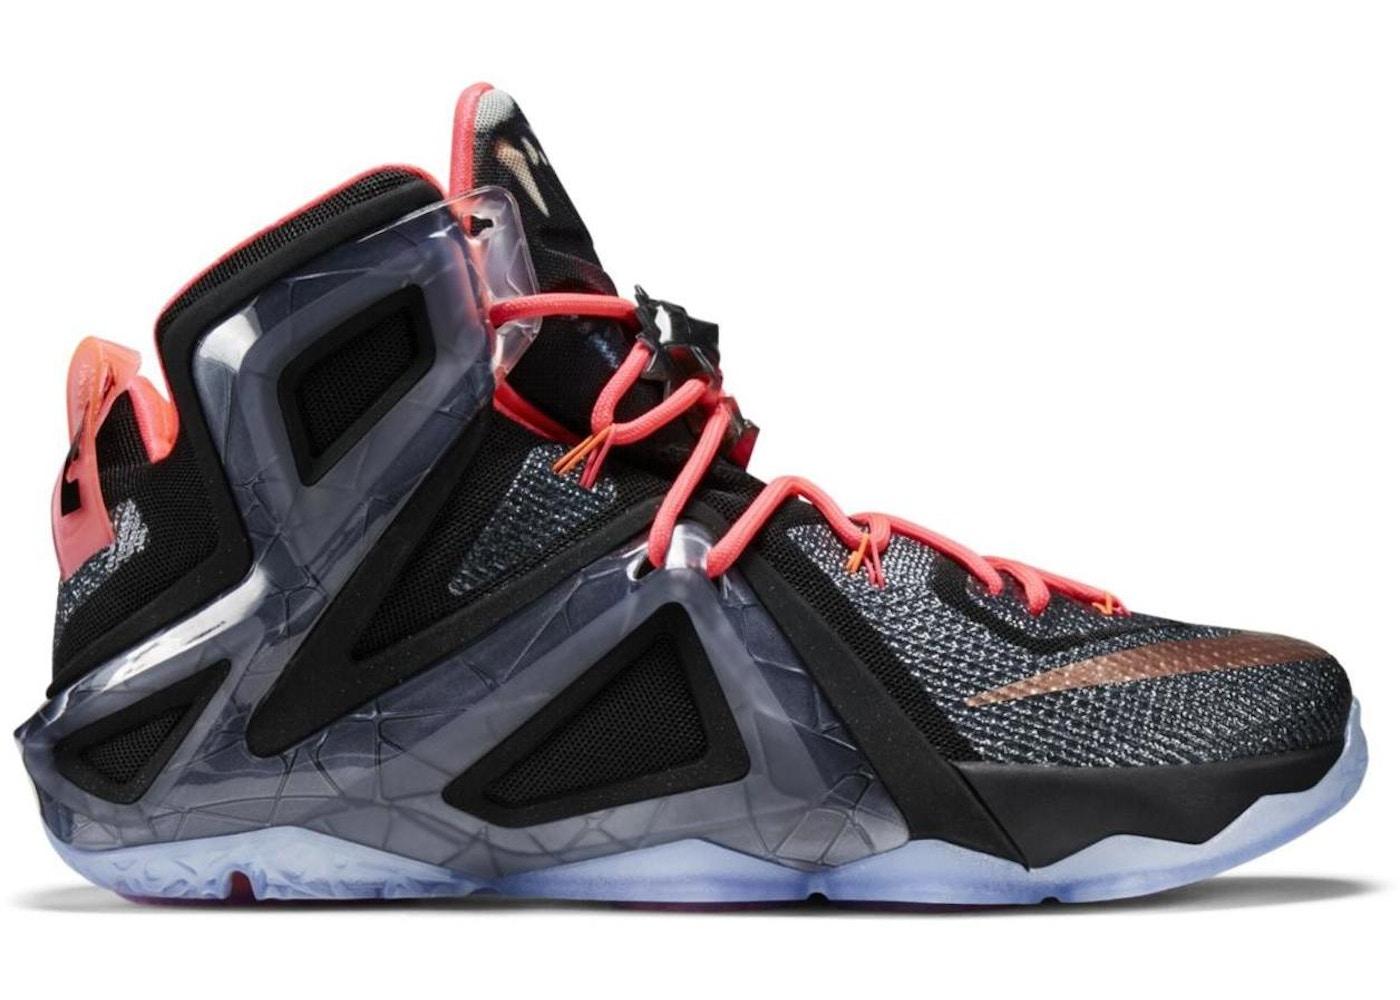 finest selection 98c3e 72635 Nike LeBron 12 Shoes - Last Sale